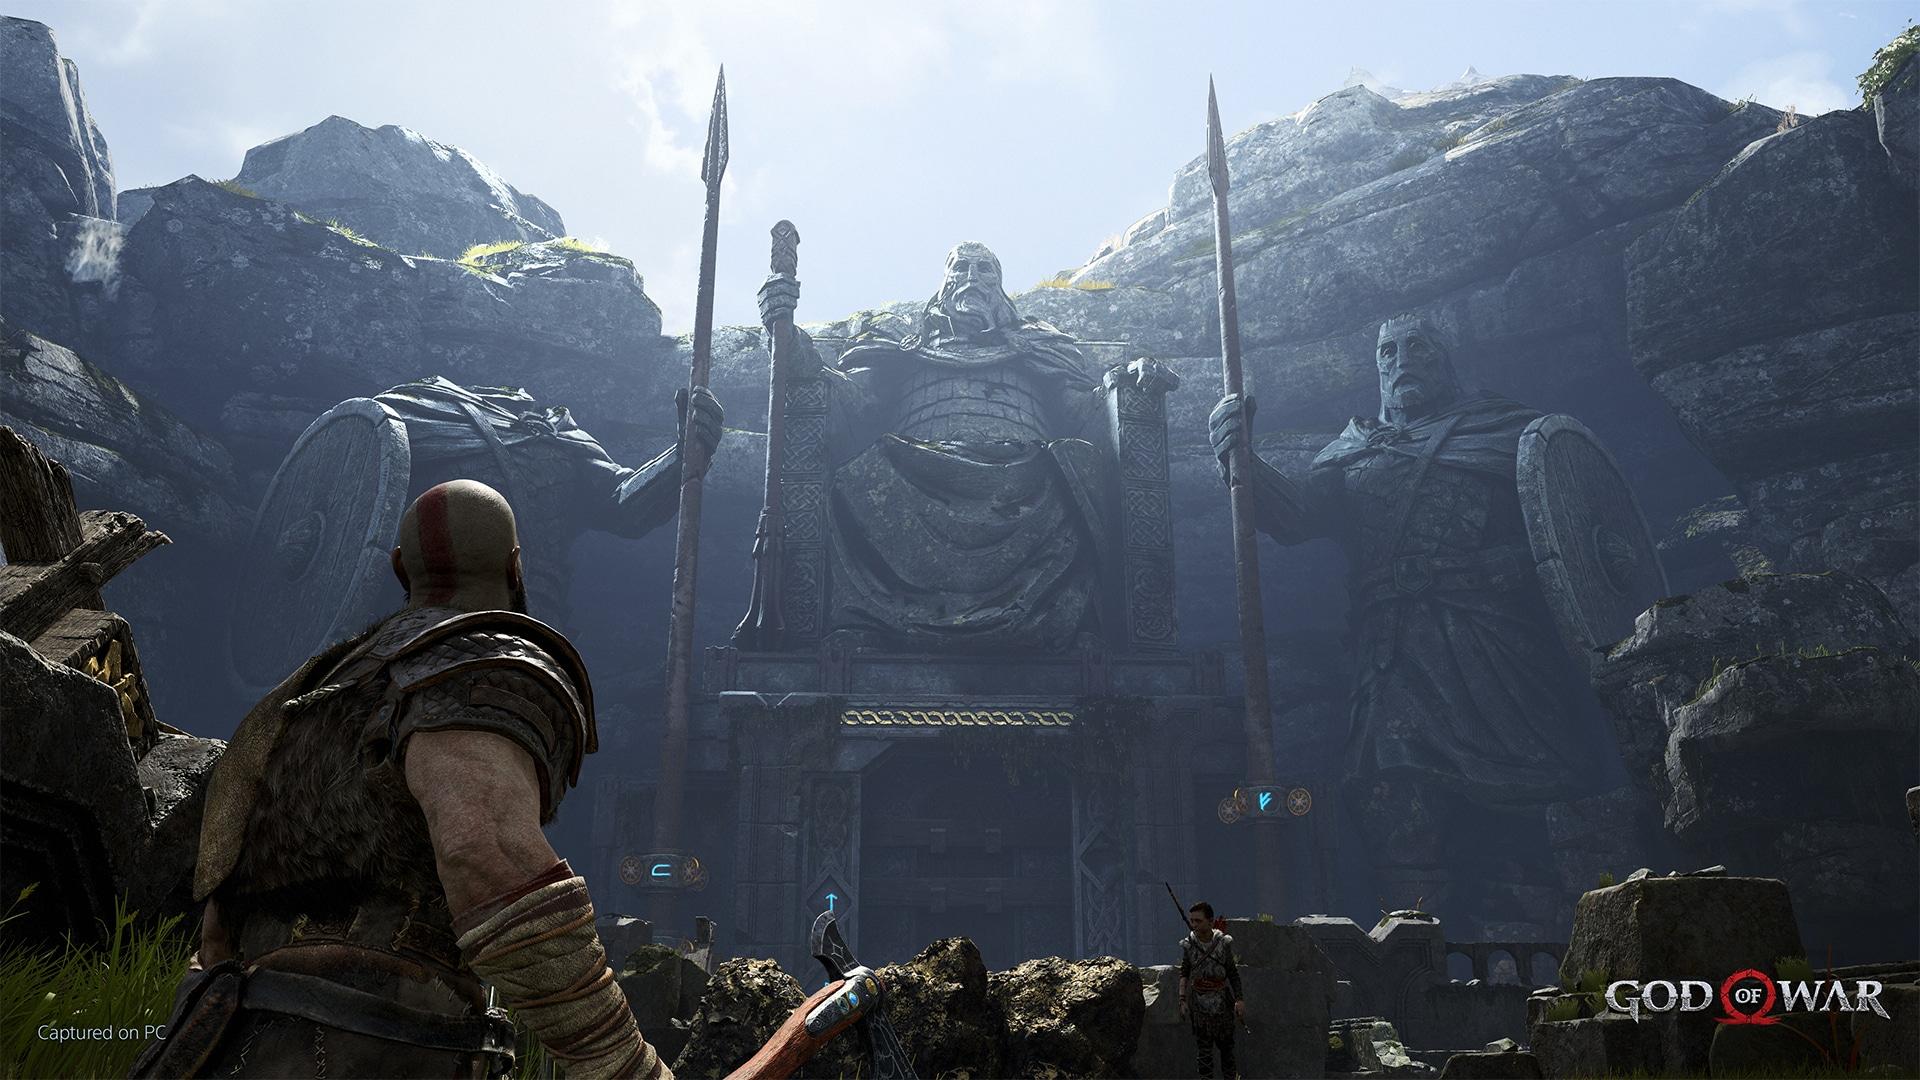 God of War PC release date Steam January 14, 2022 Santa Monica Studio PlayStation Studios